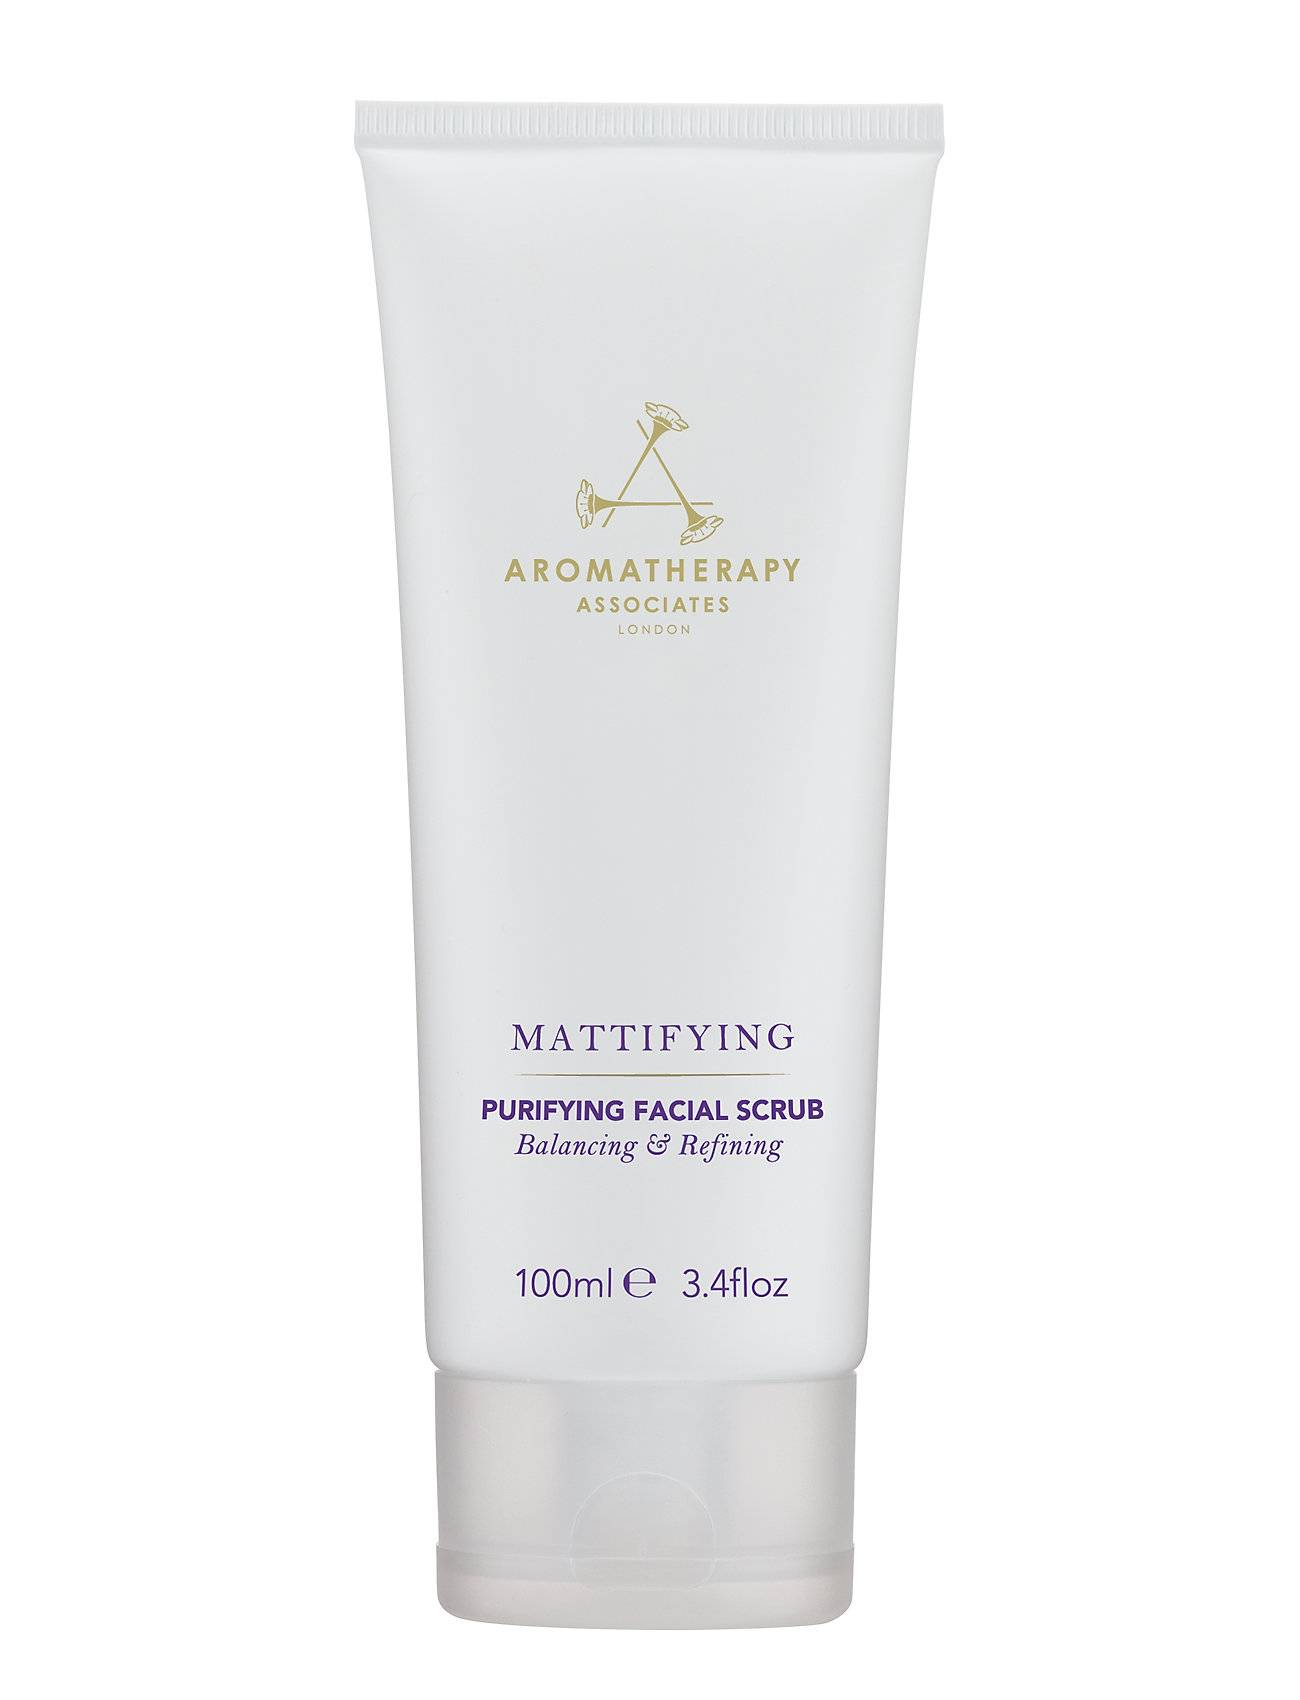 Aromatherapy Associates Mattifying Purrifying Facial Scrub Kuorinta-aine Kasvojen Kuorinta Nude Aromatherapy Associates